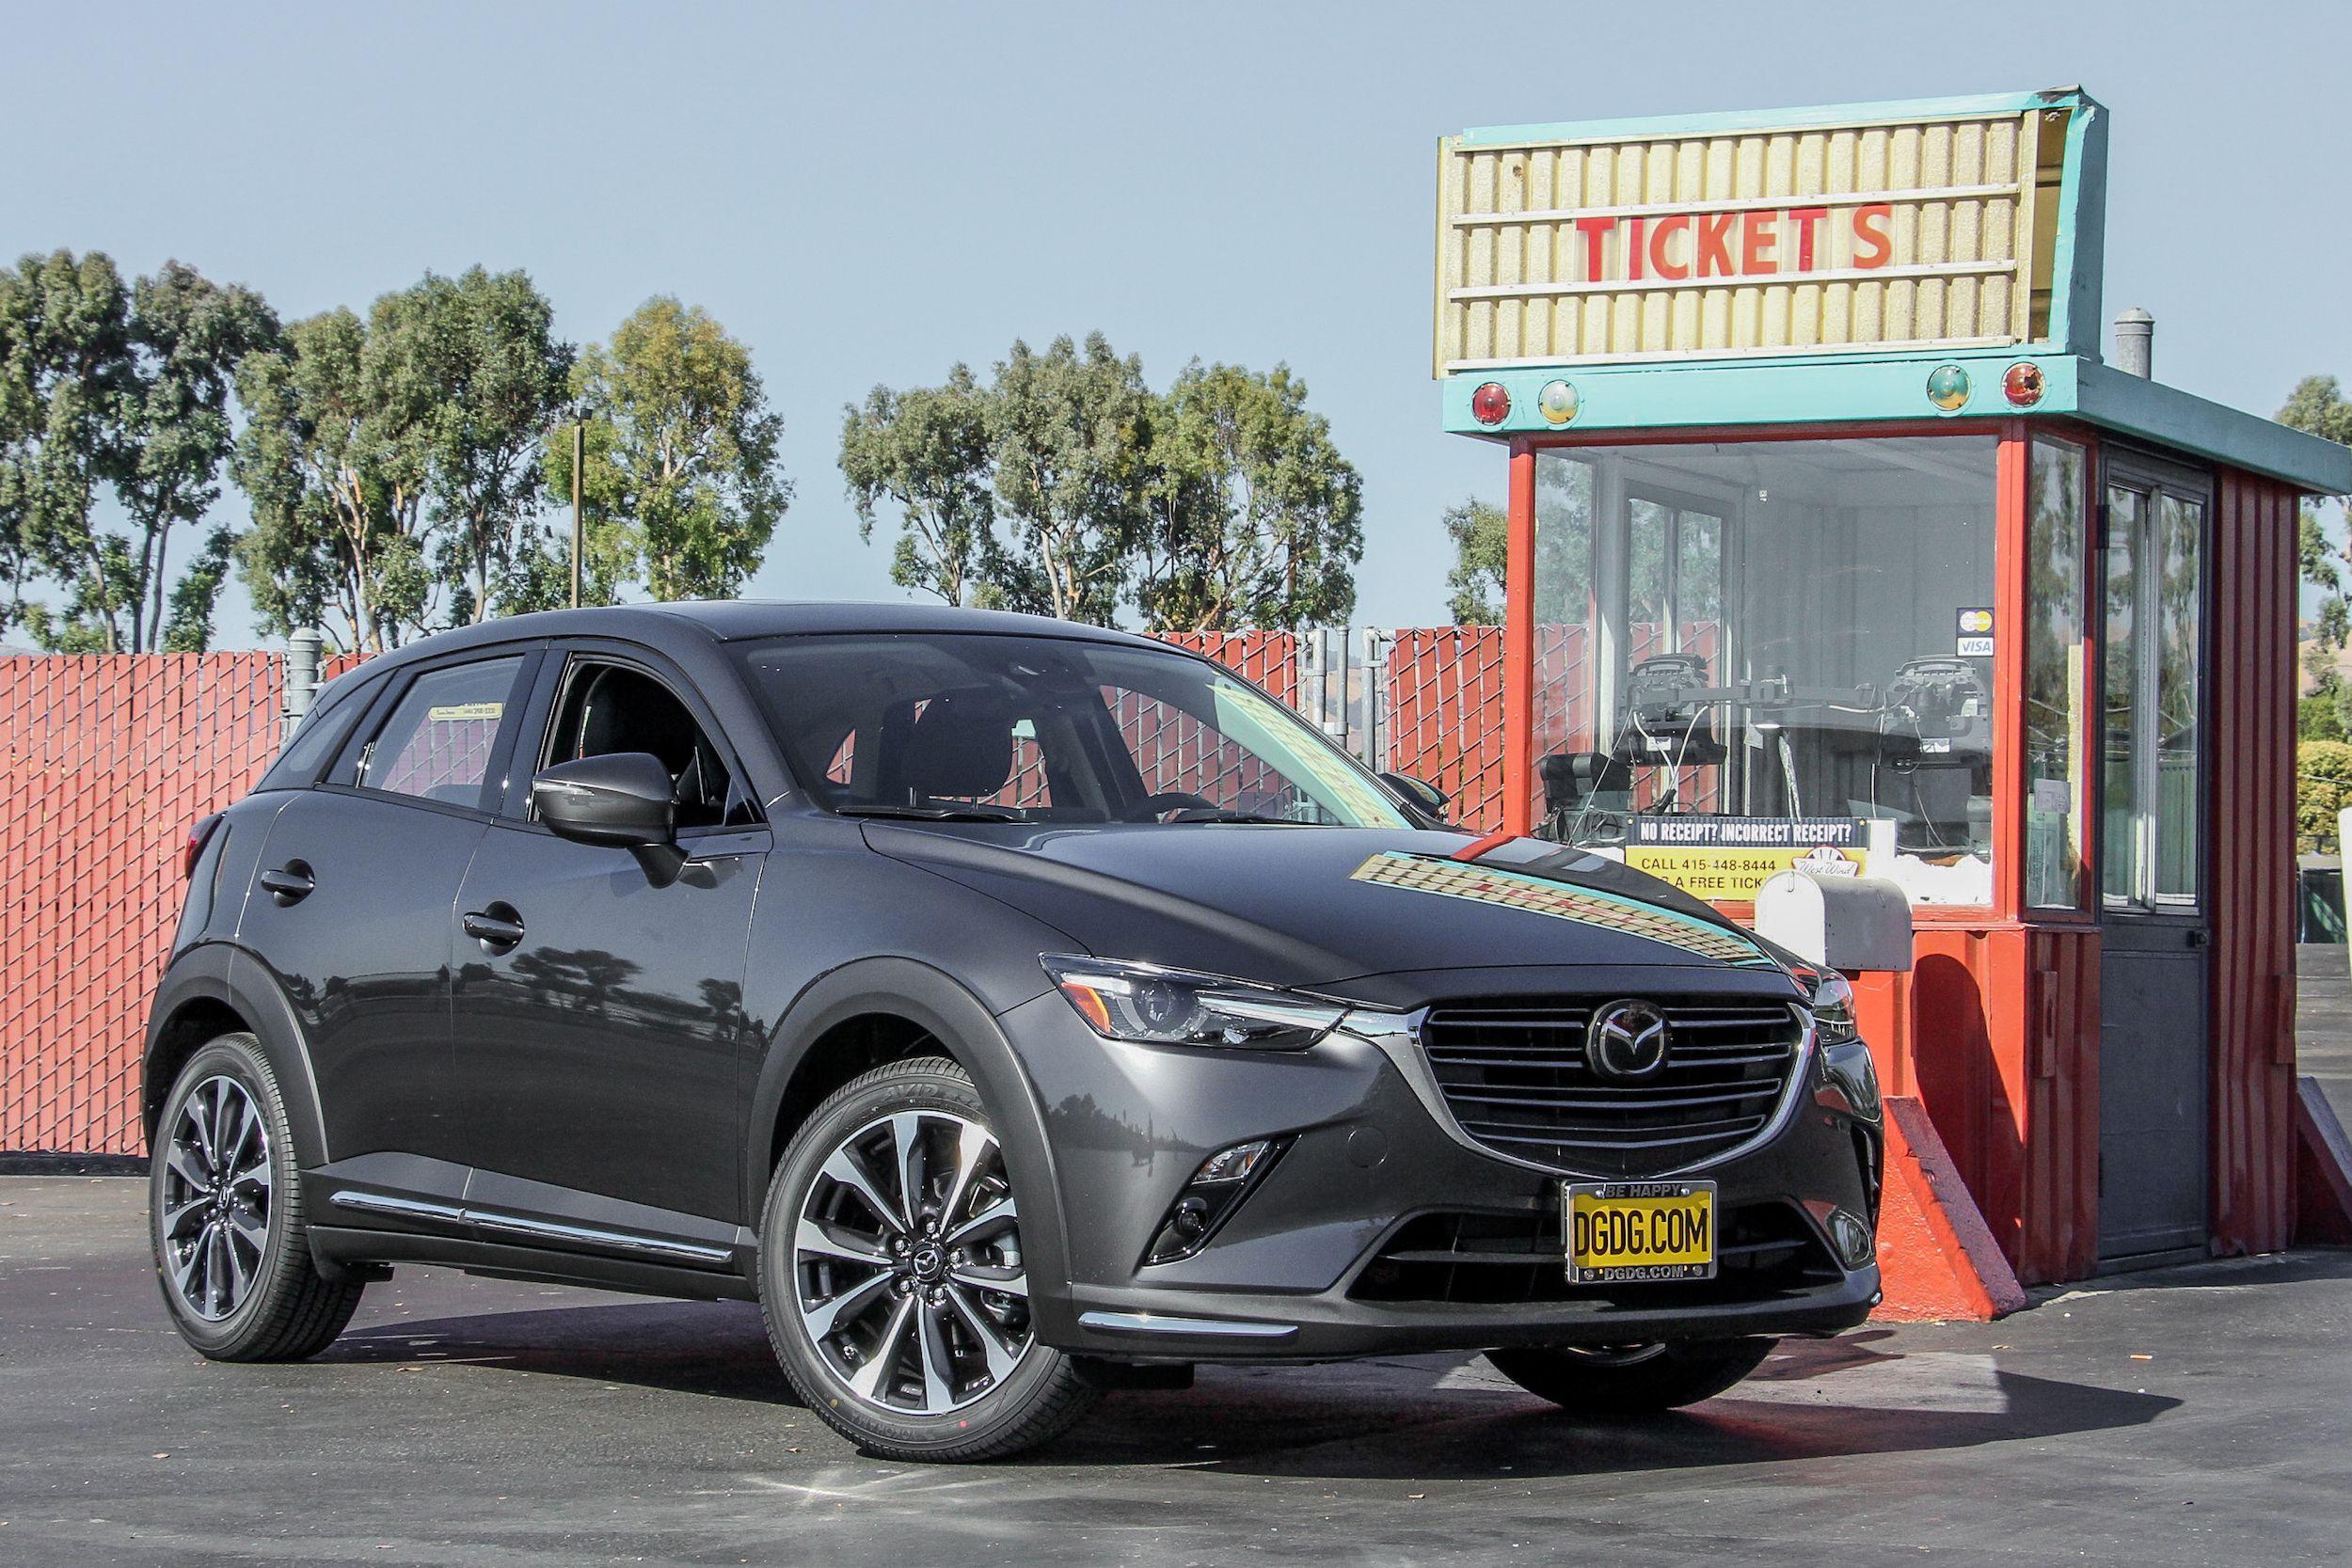 48 Oak Tree Mazda Ideas In 2021 Mazda San Francisco Bay Area New And Used Cars